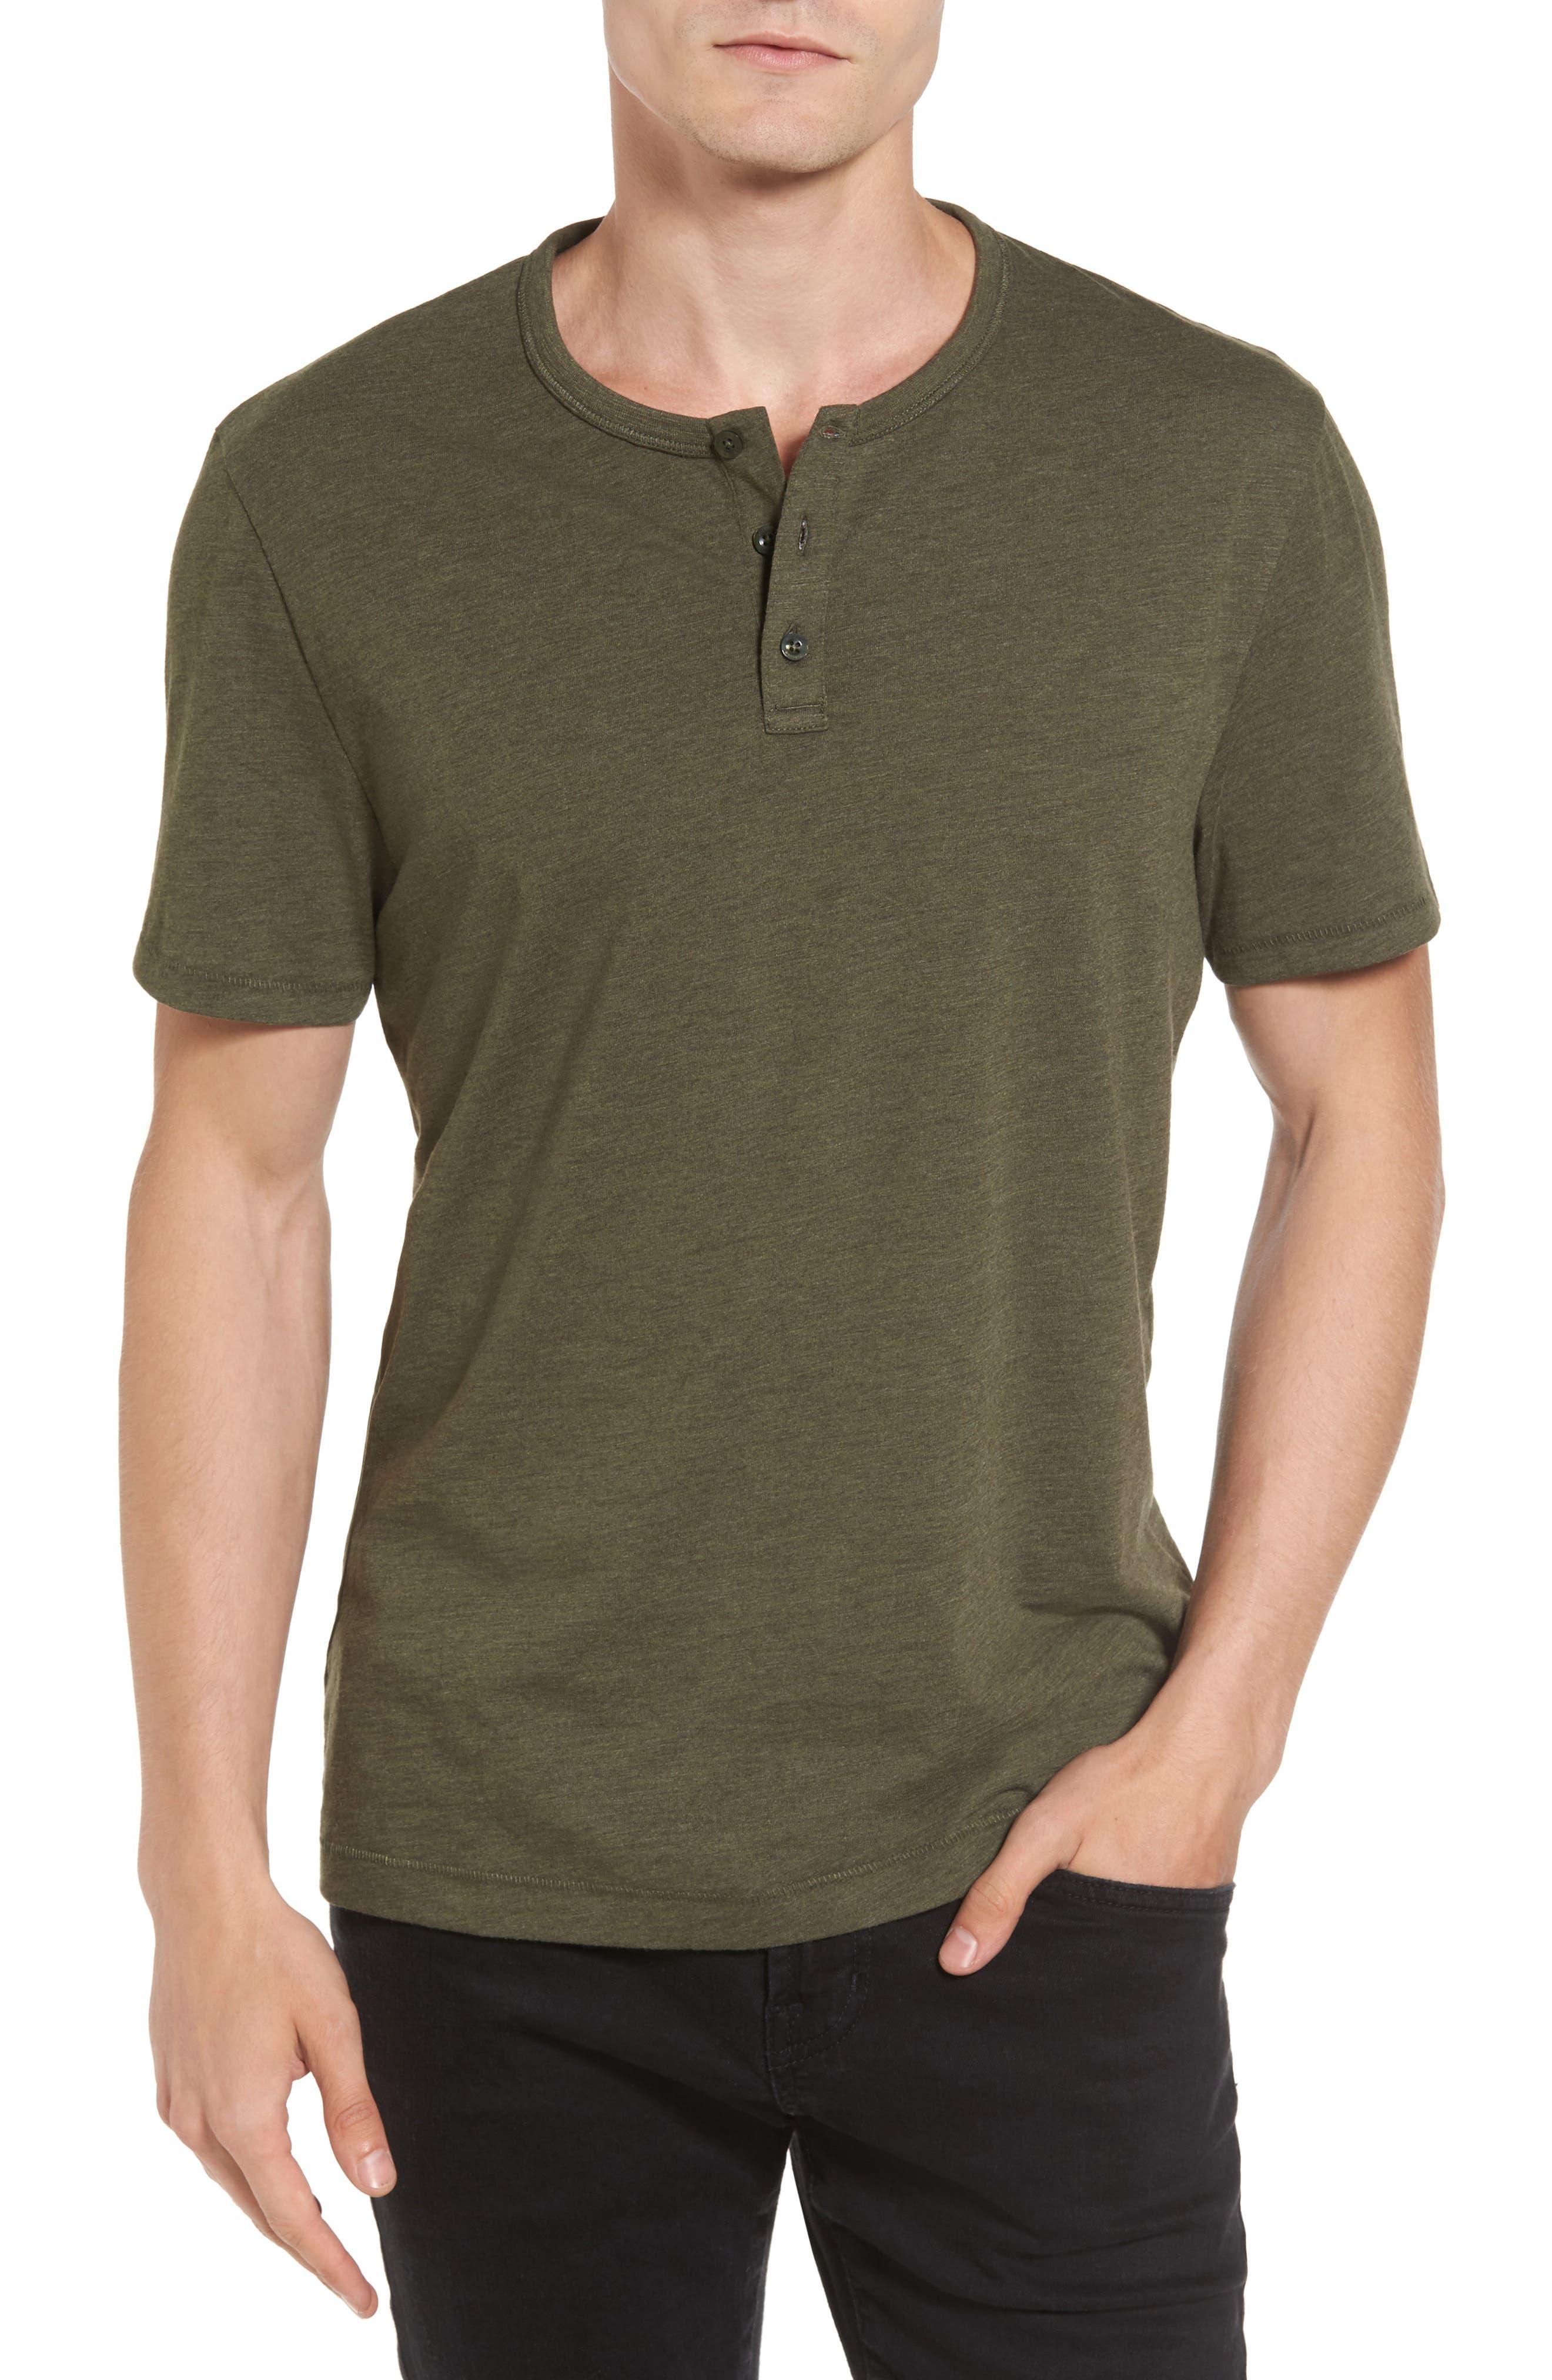 Bing Short Sleeve Henley Shirt,                             Main thumbnail 1, color,                             306